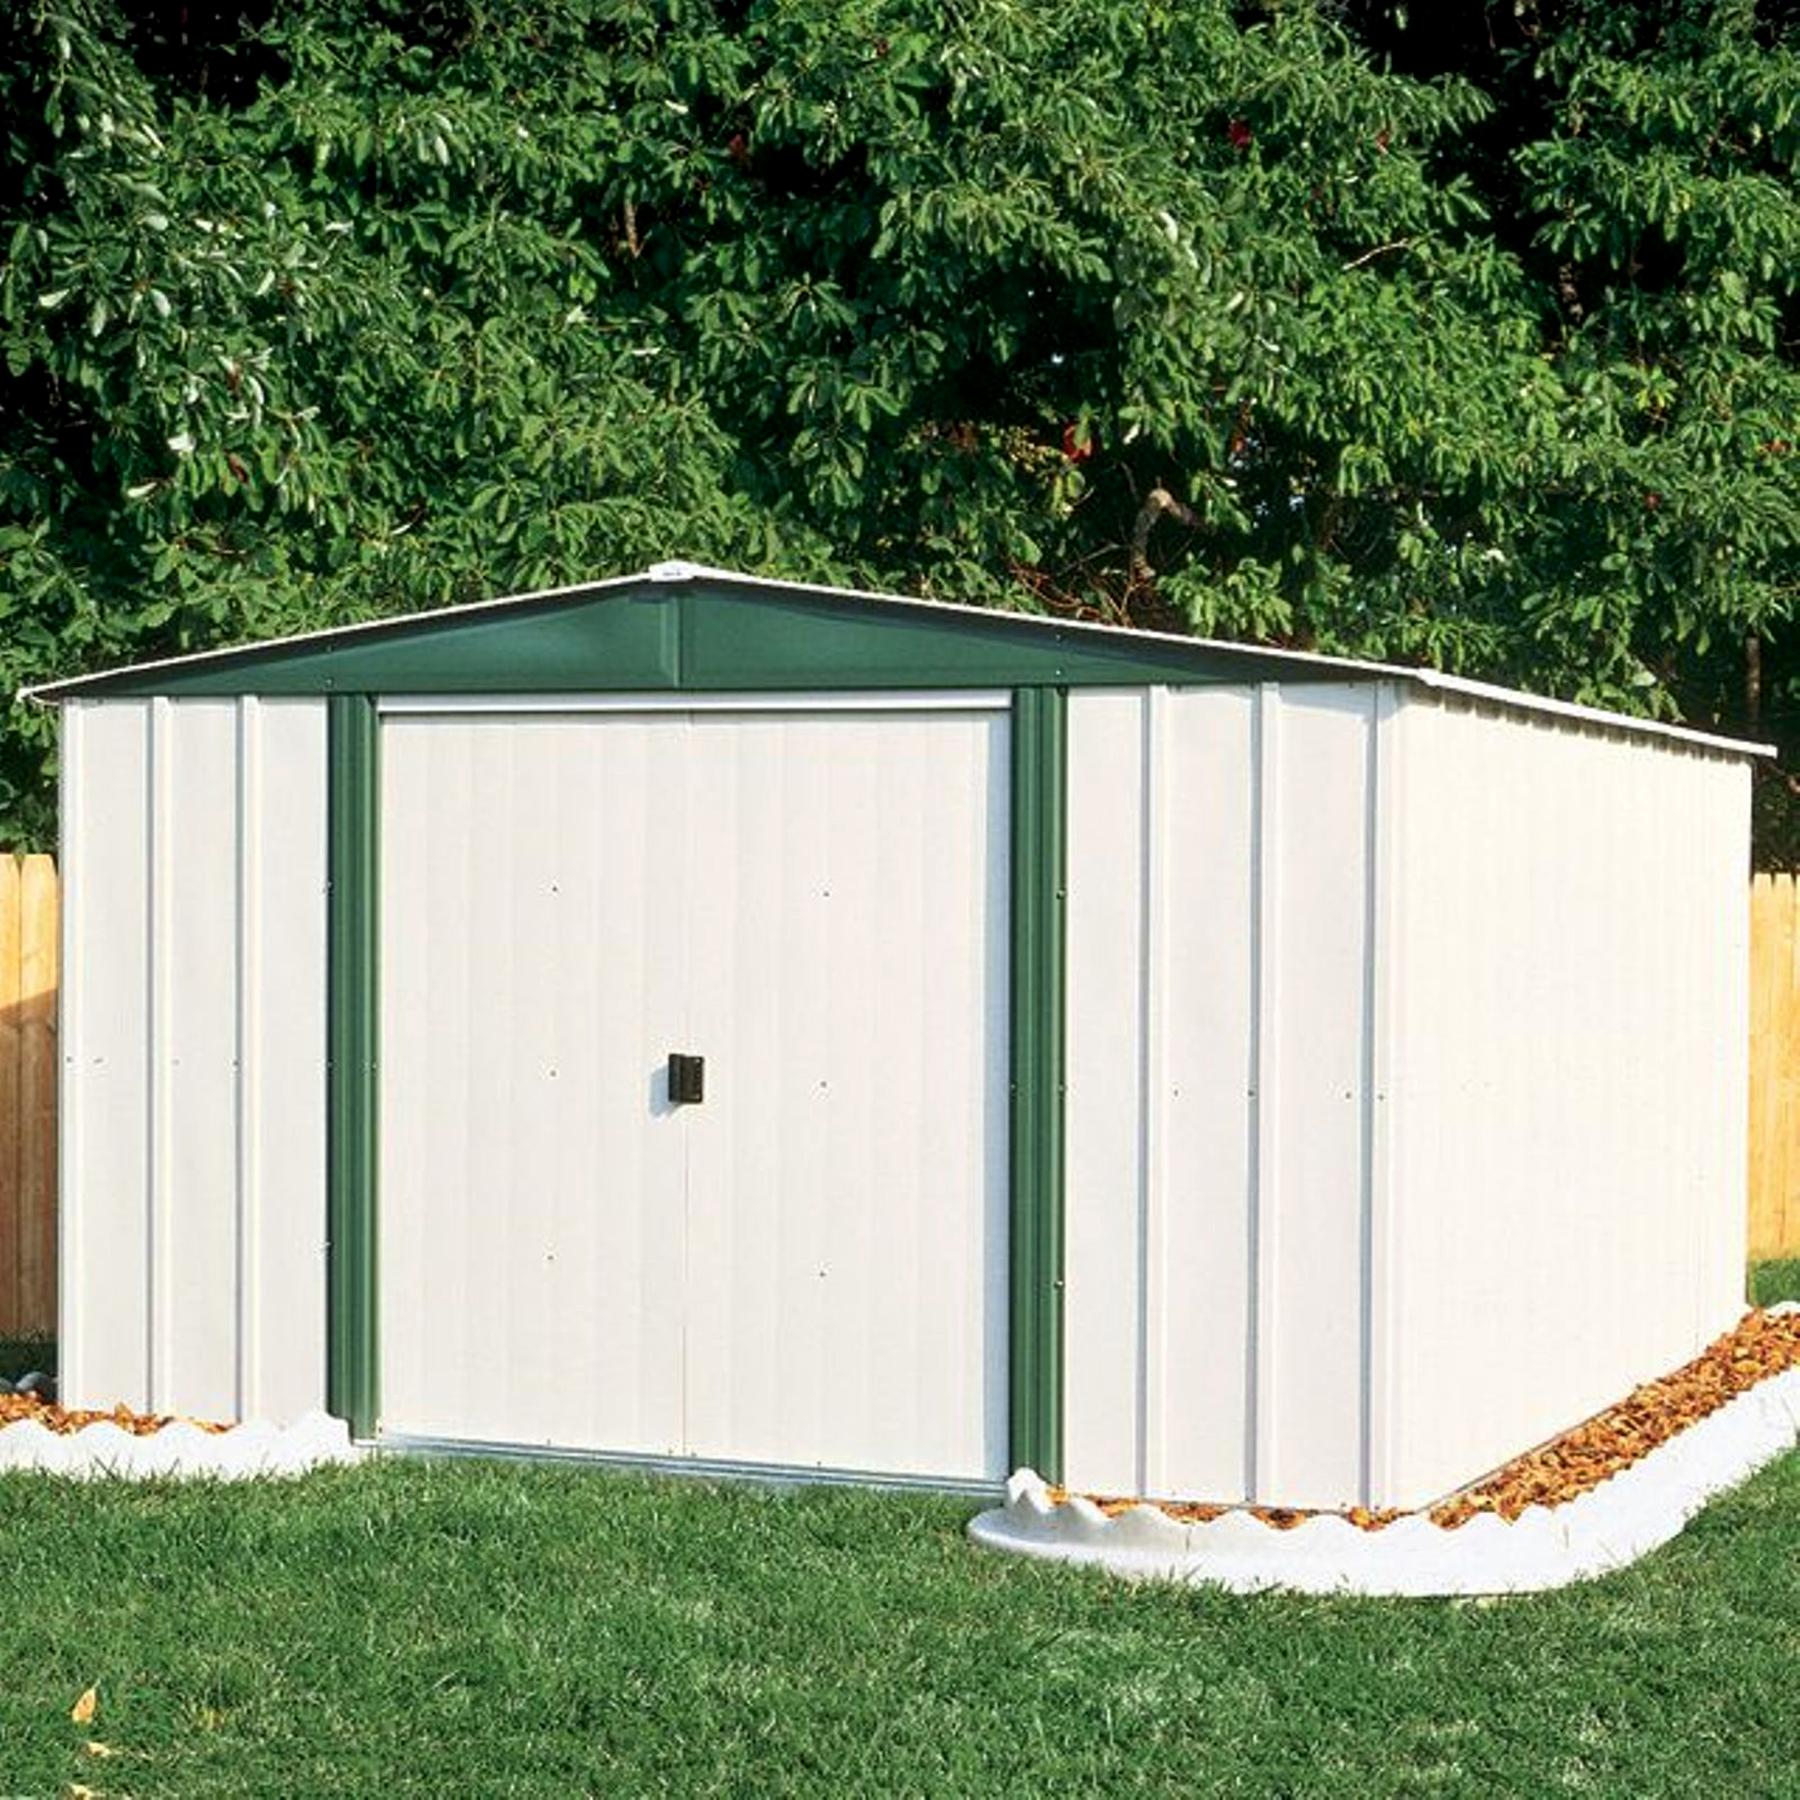 Arrow Gable Steel Lawn Building Eggshellgreen image